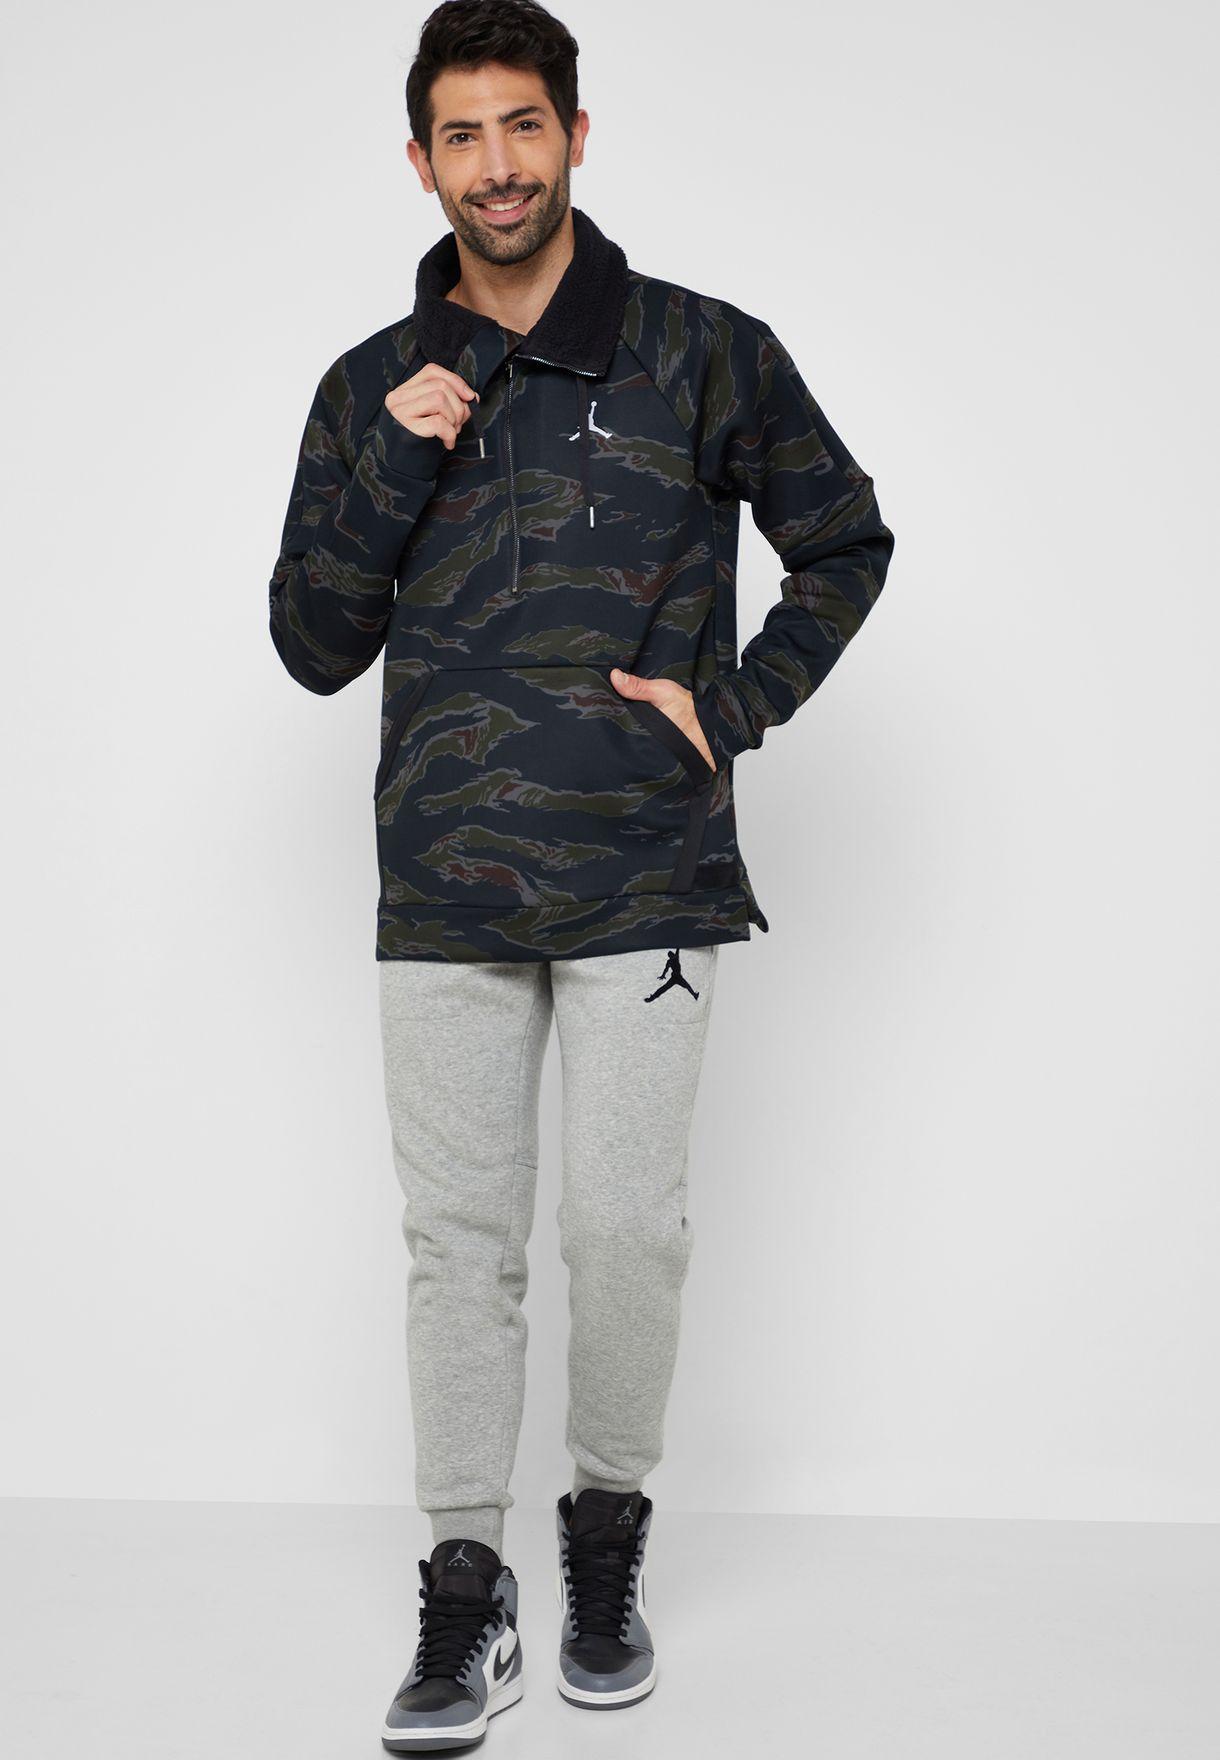 c14ff8ddbd0 Shop Nike black Jordan Flight Tech Camo Anorak Jacket AH6163-010 for ...